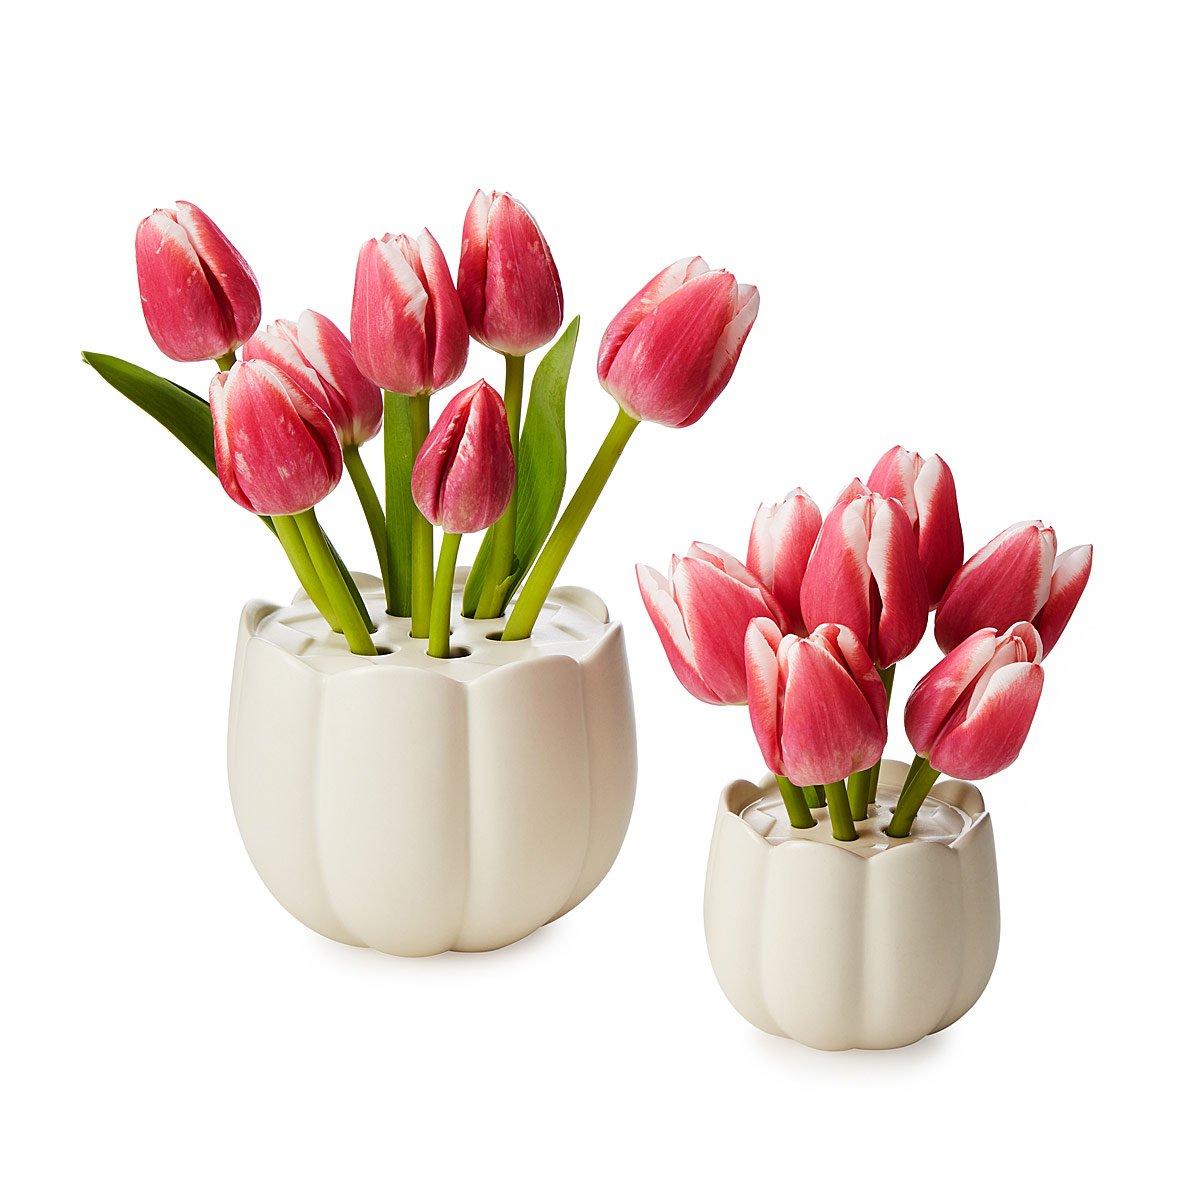 dress - Vase Flower pictures video